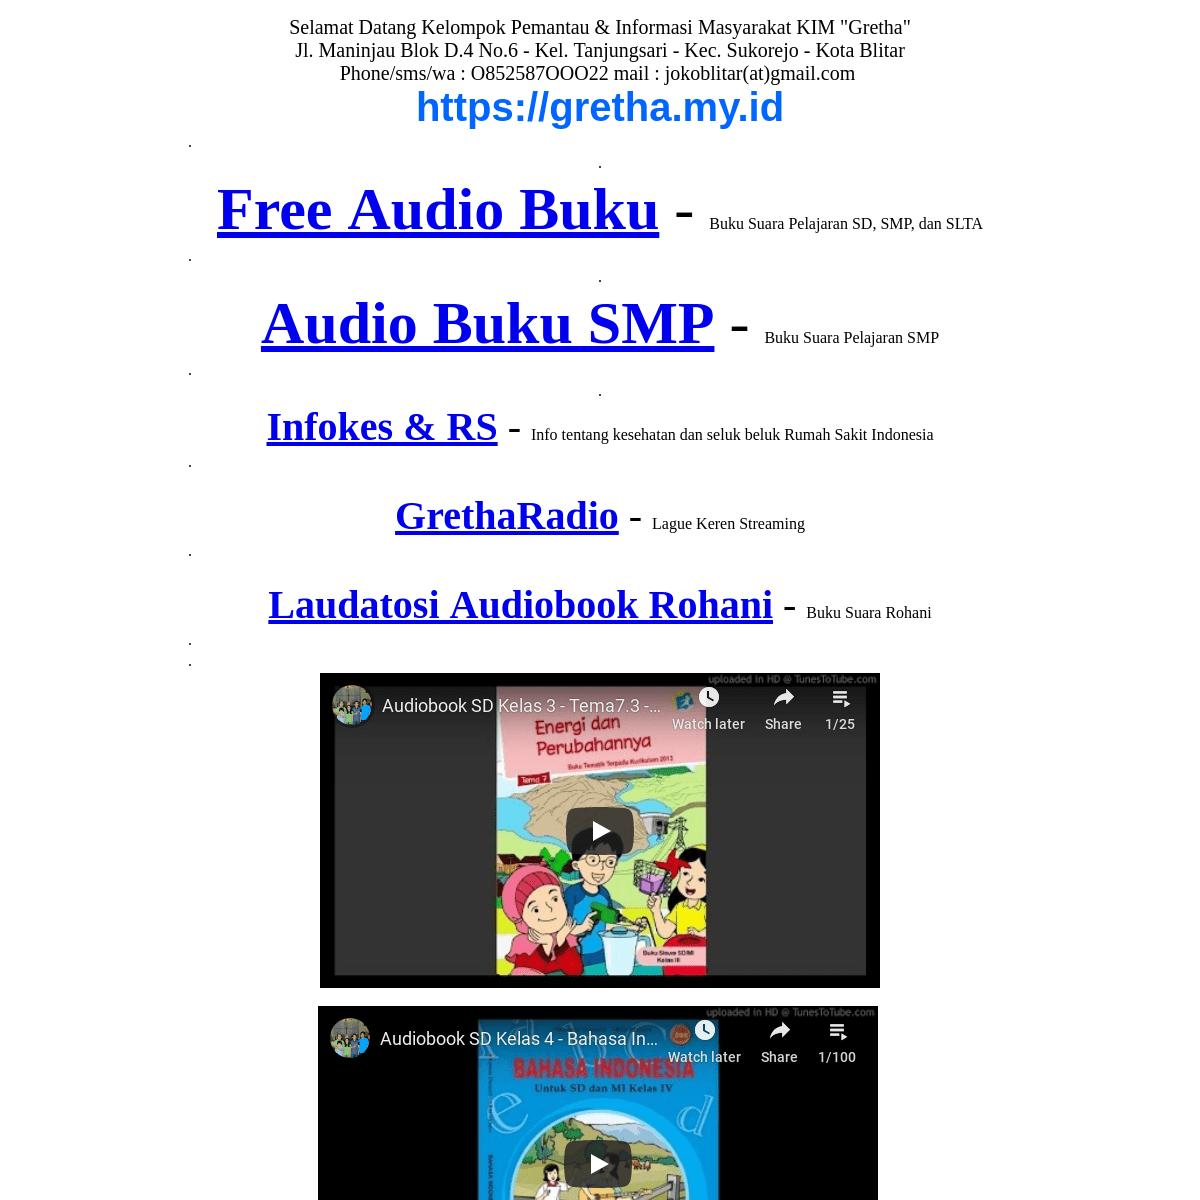 Gretha.My.id (Audiobuku Pendidikan Indonesia)